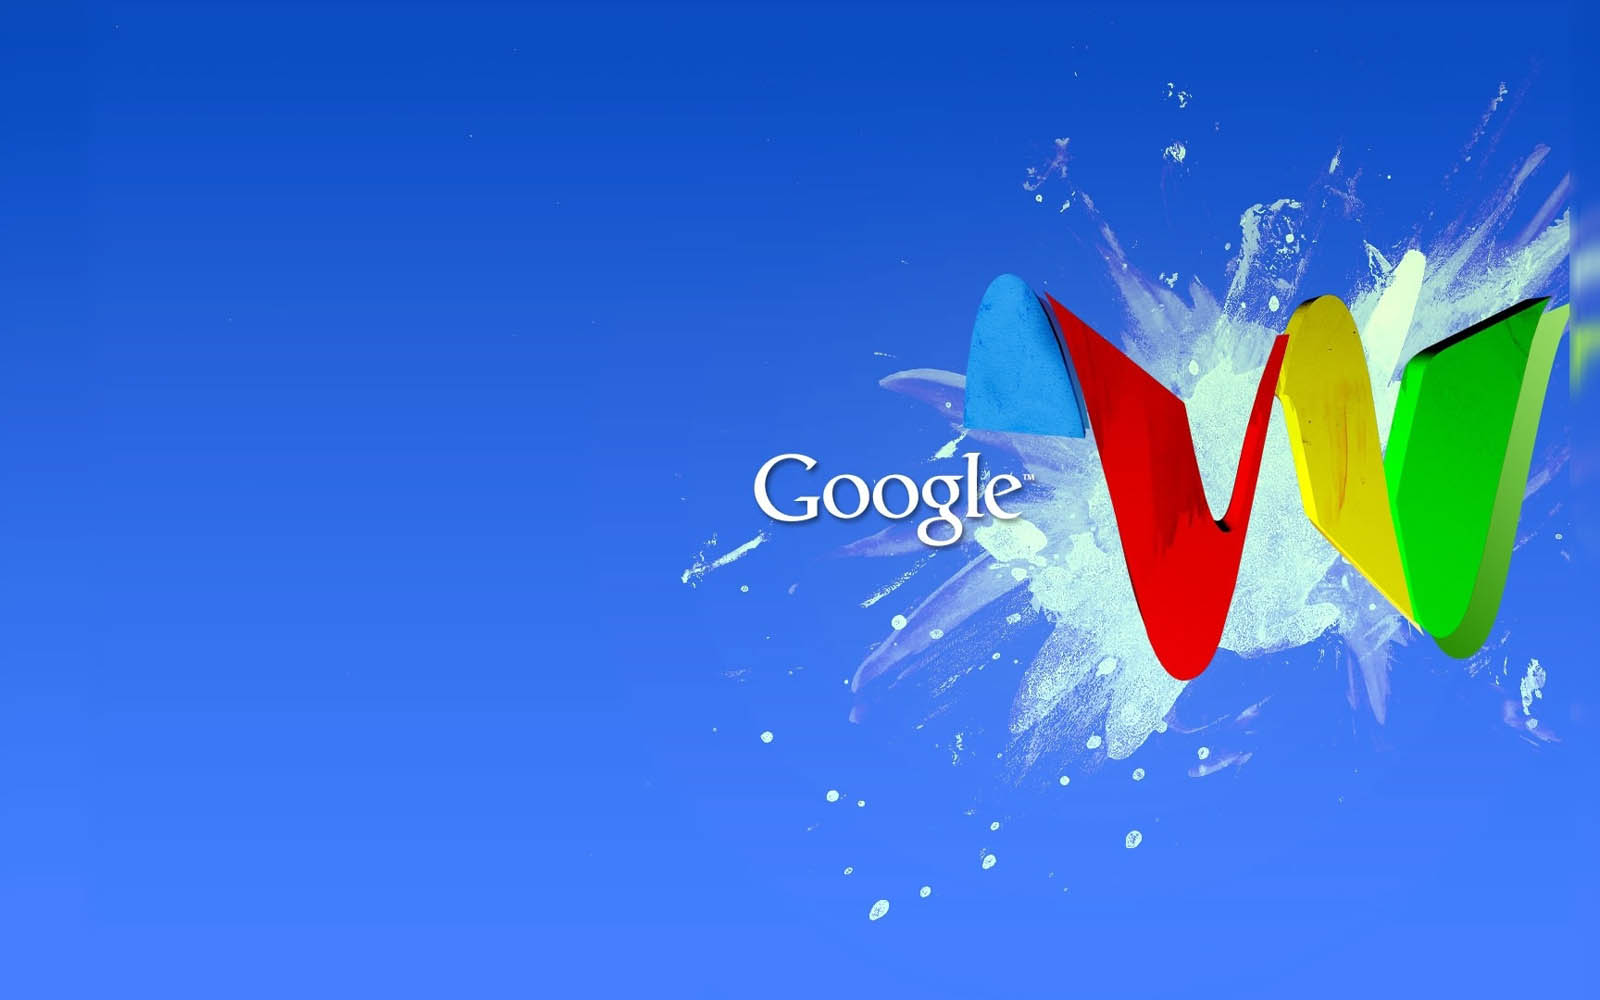 77+] Free Google Desktop Backgrounds on WallpaperSafari